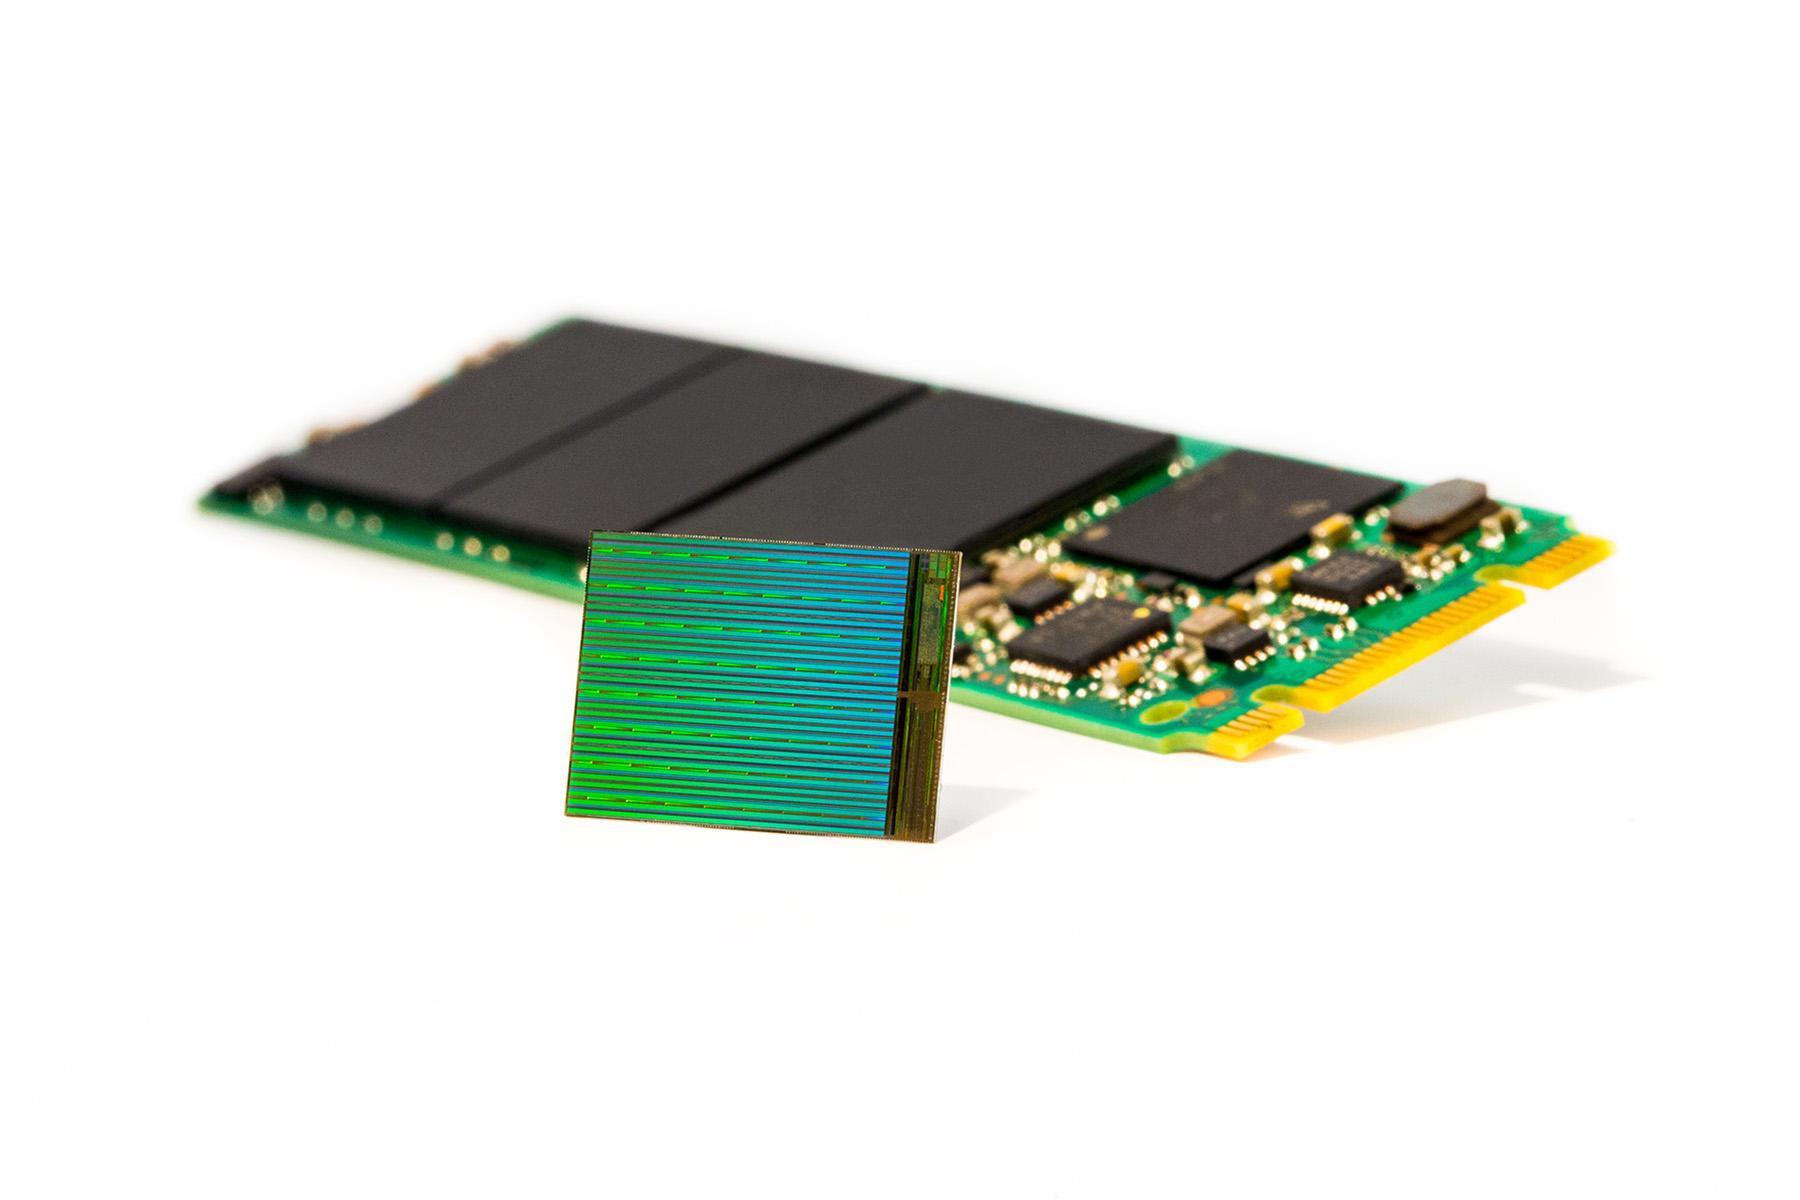 3D_NAND_Die_with_M2_SSD.jpg